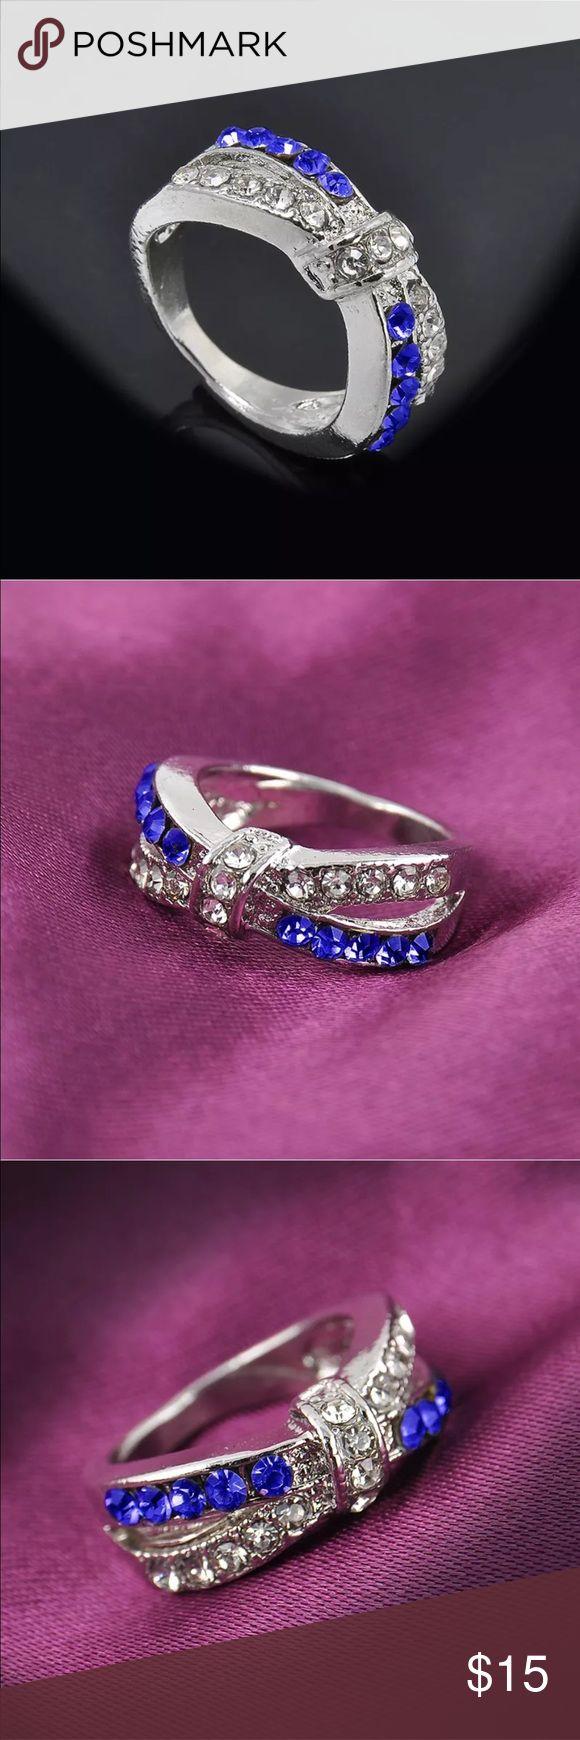 18kt gold bracelet w / sapphires & Diamond accent NWT | Sapphire ...